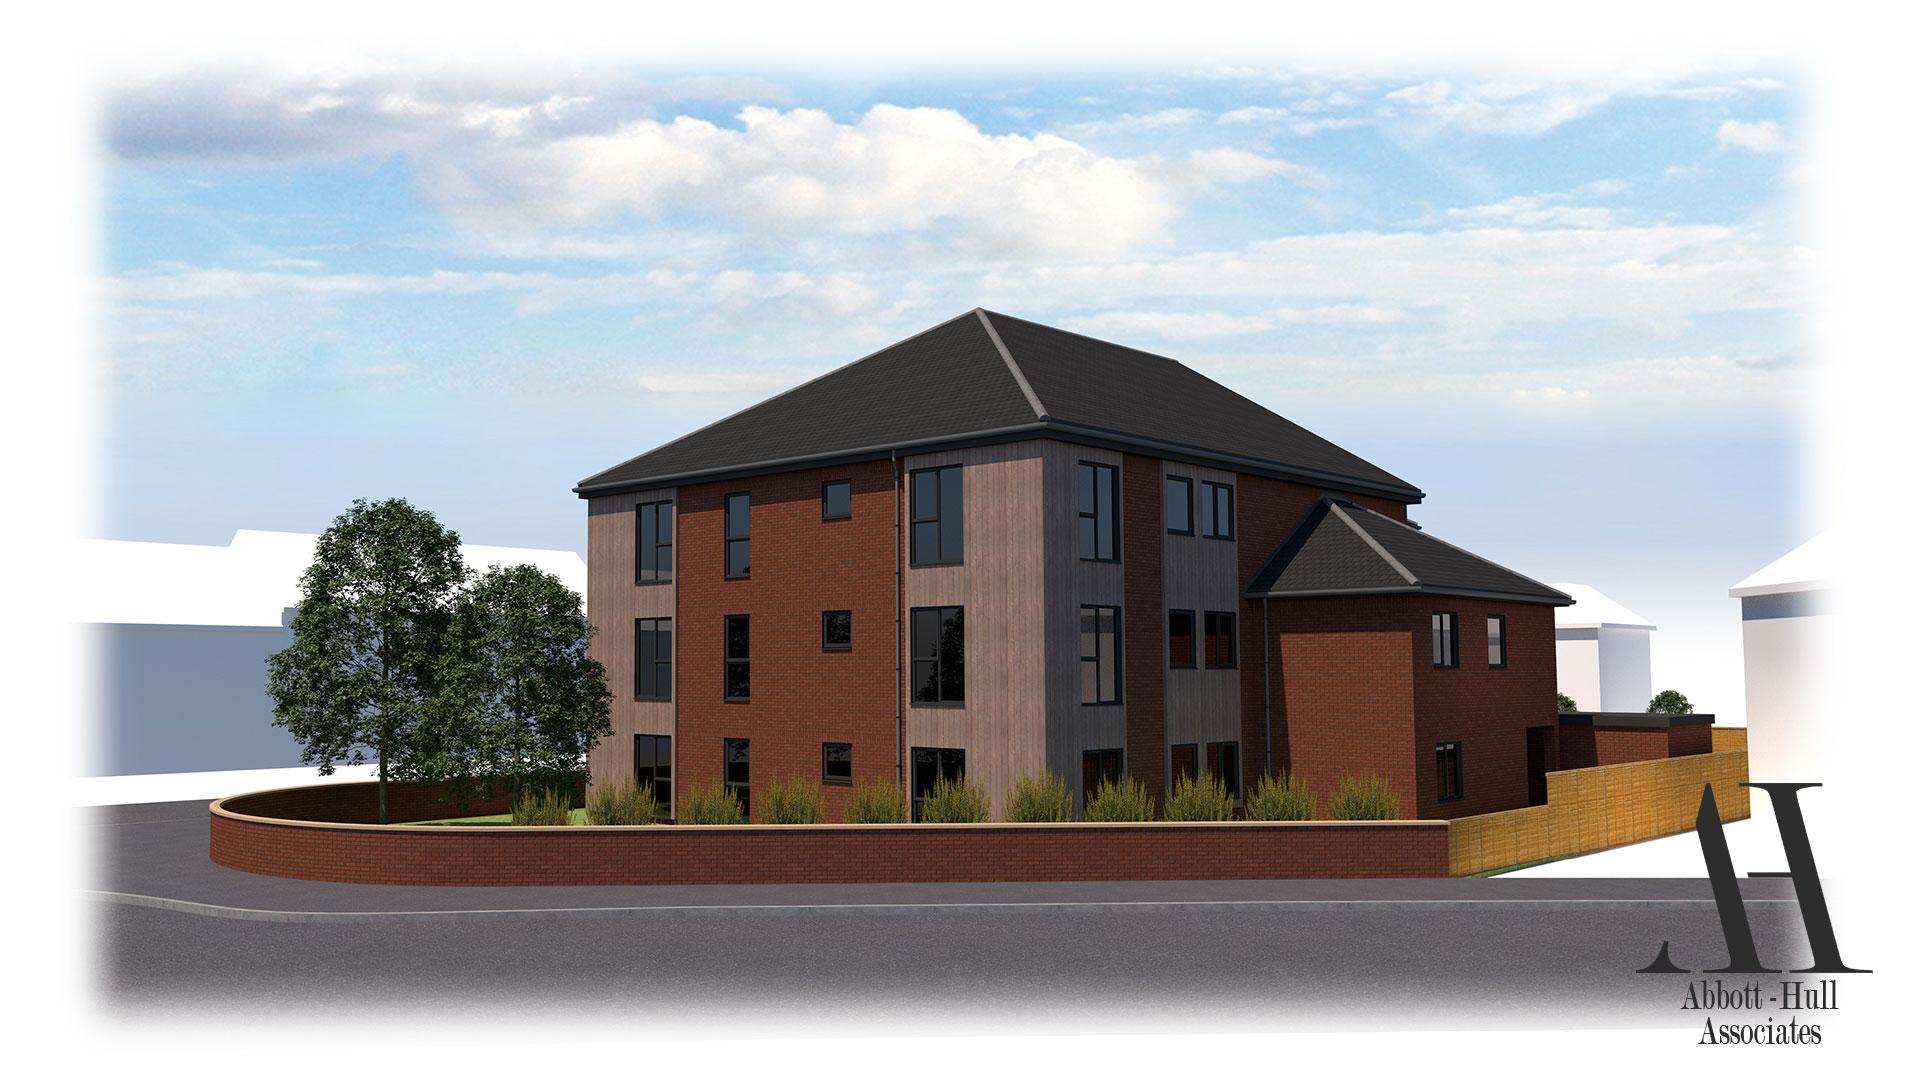 Waterloo Road, Blackpool, New Apartment Block - Proposed Visual D